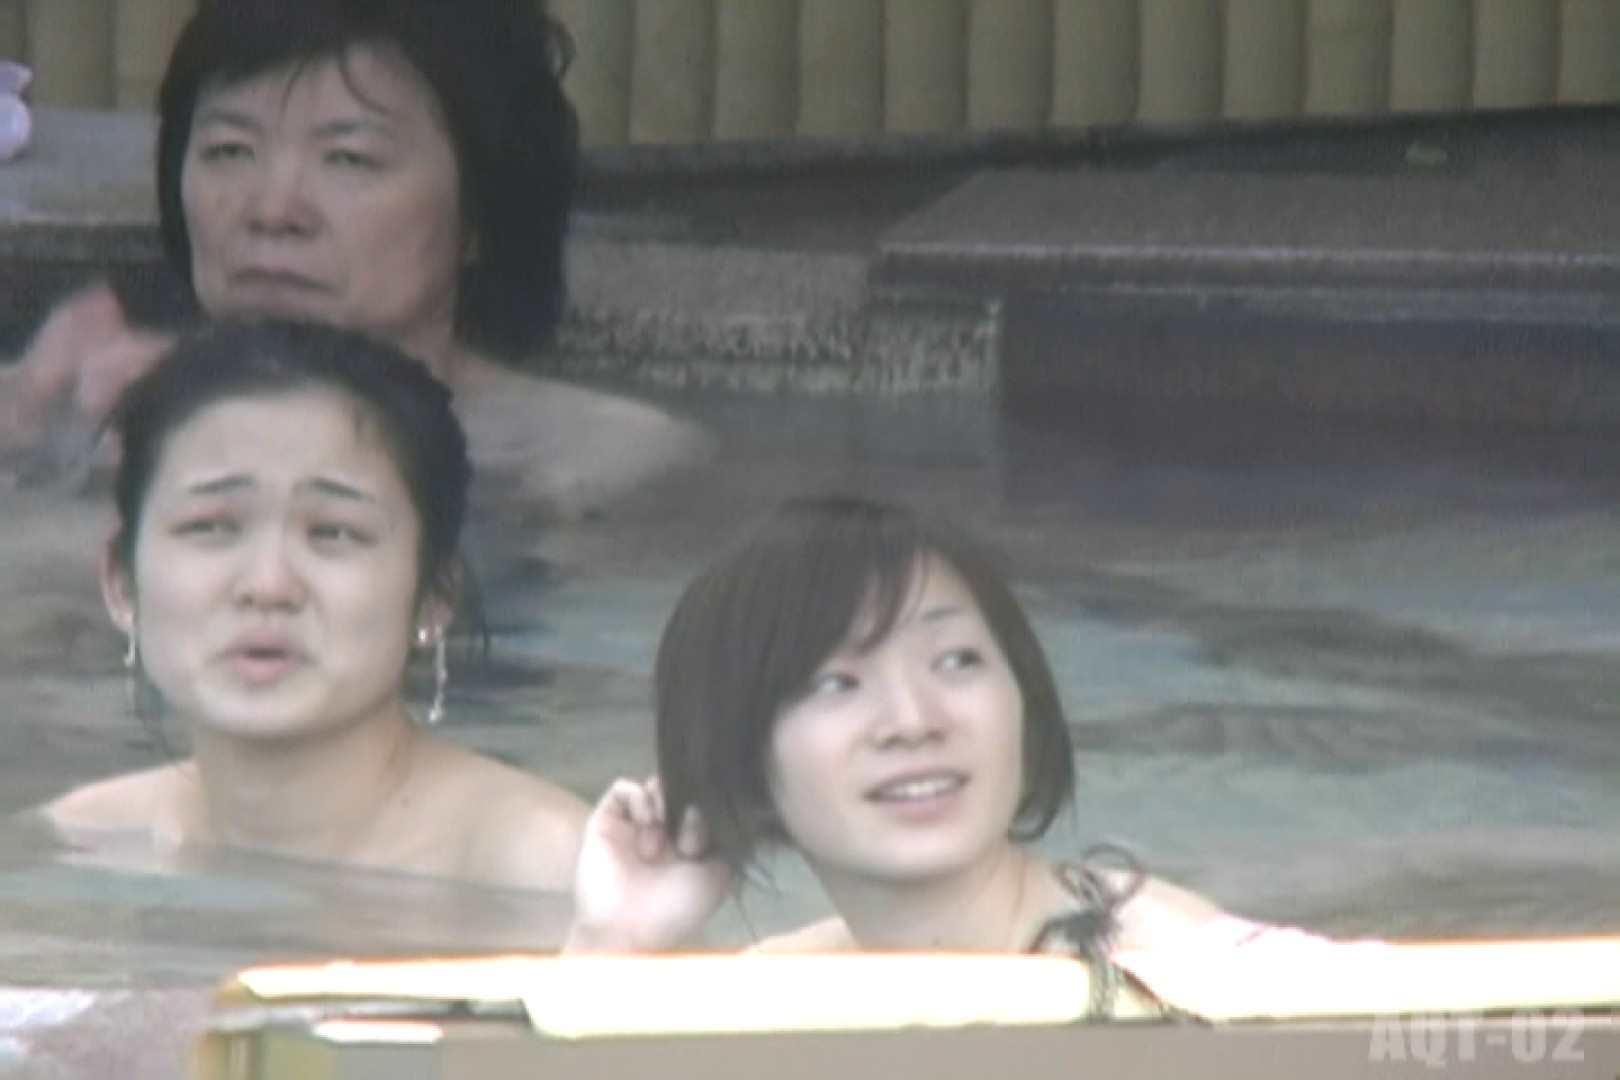 Aquaな露天風呂Vol.725 OLセックス 盗み撮り動画キャプチャ 90画像 23